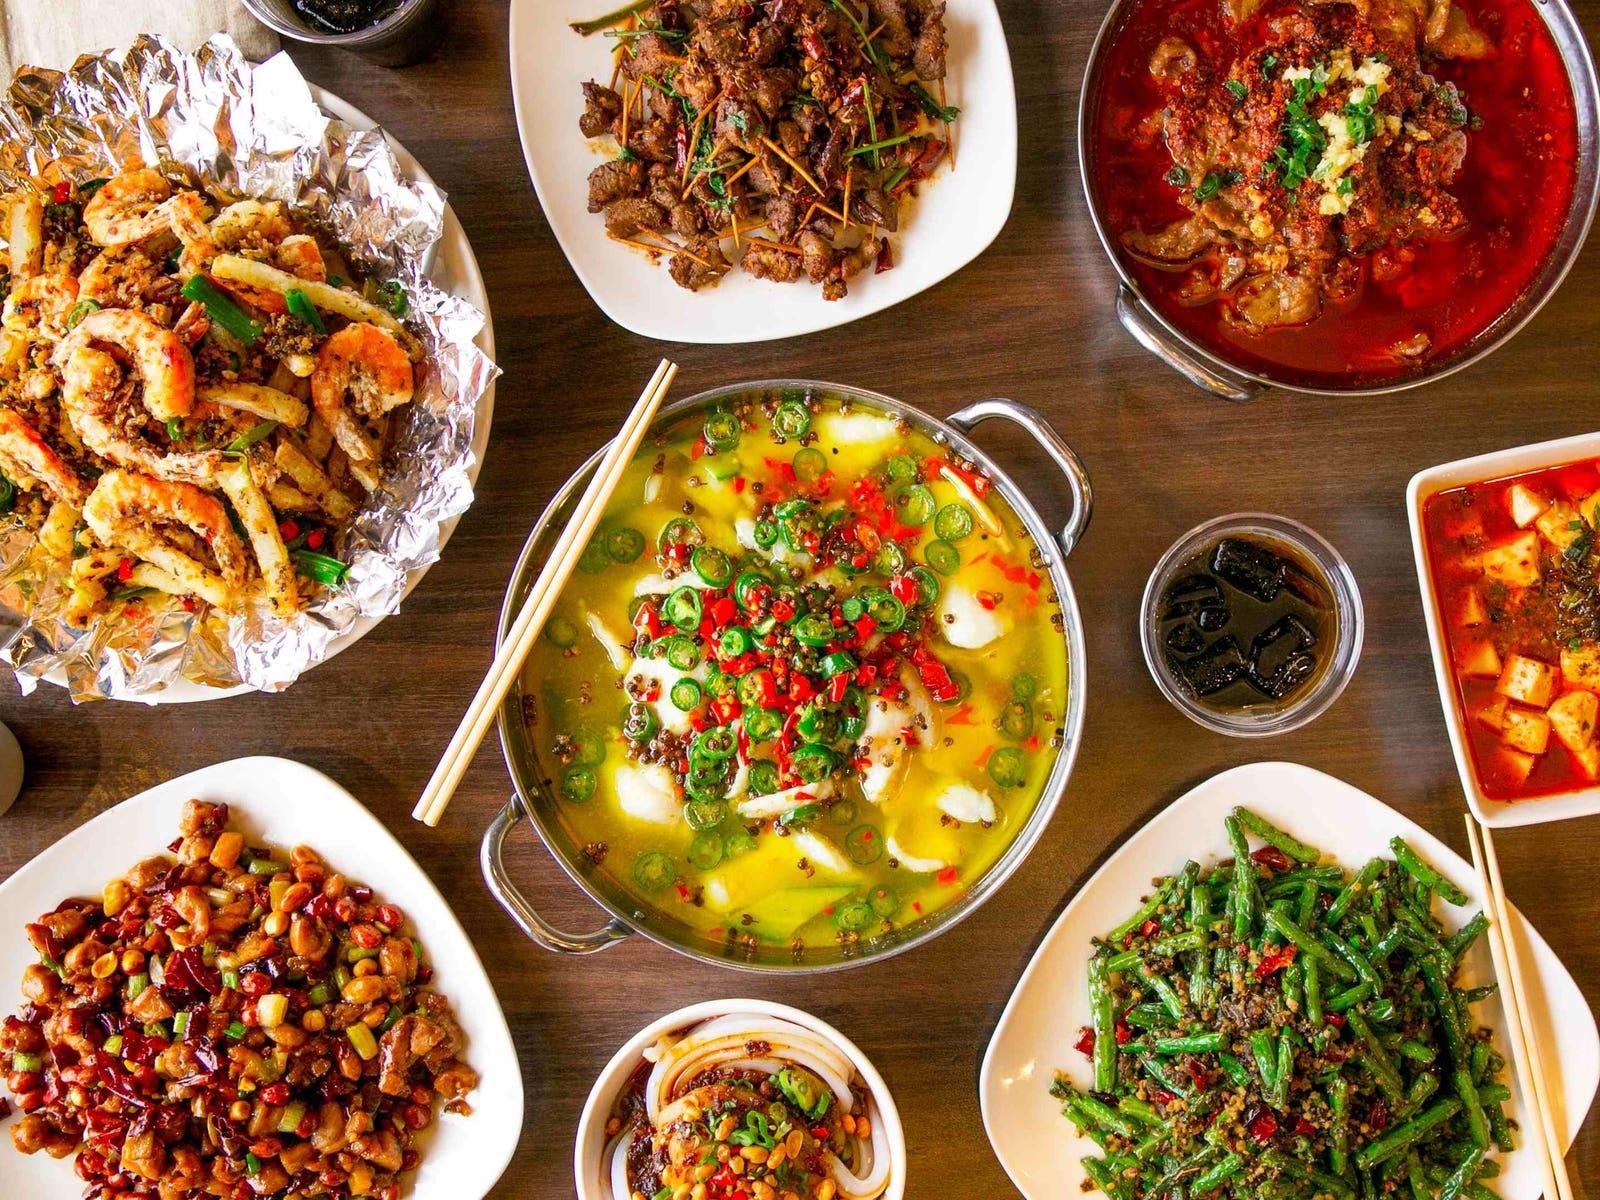 Dishes from Chengdu Taste in Alhambra